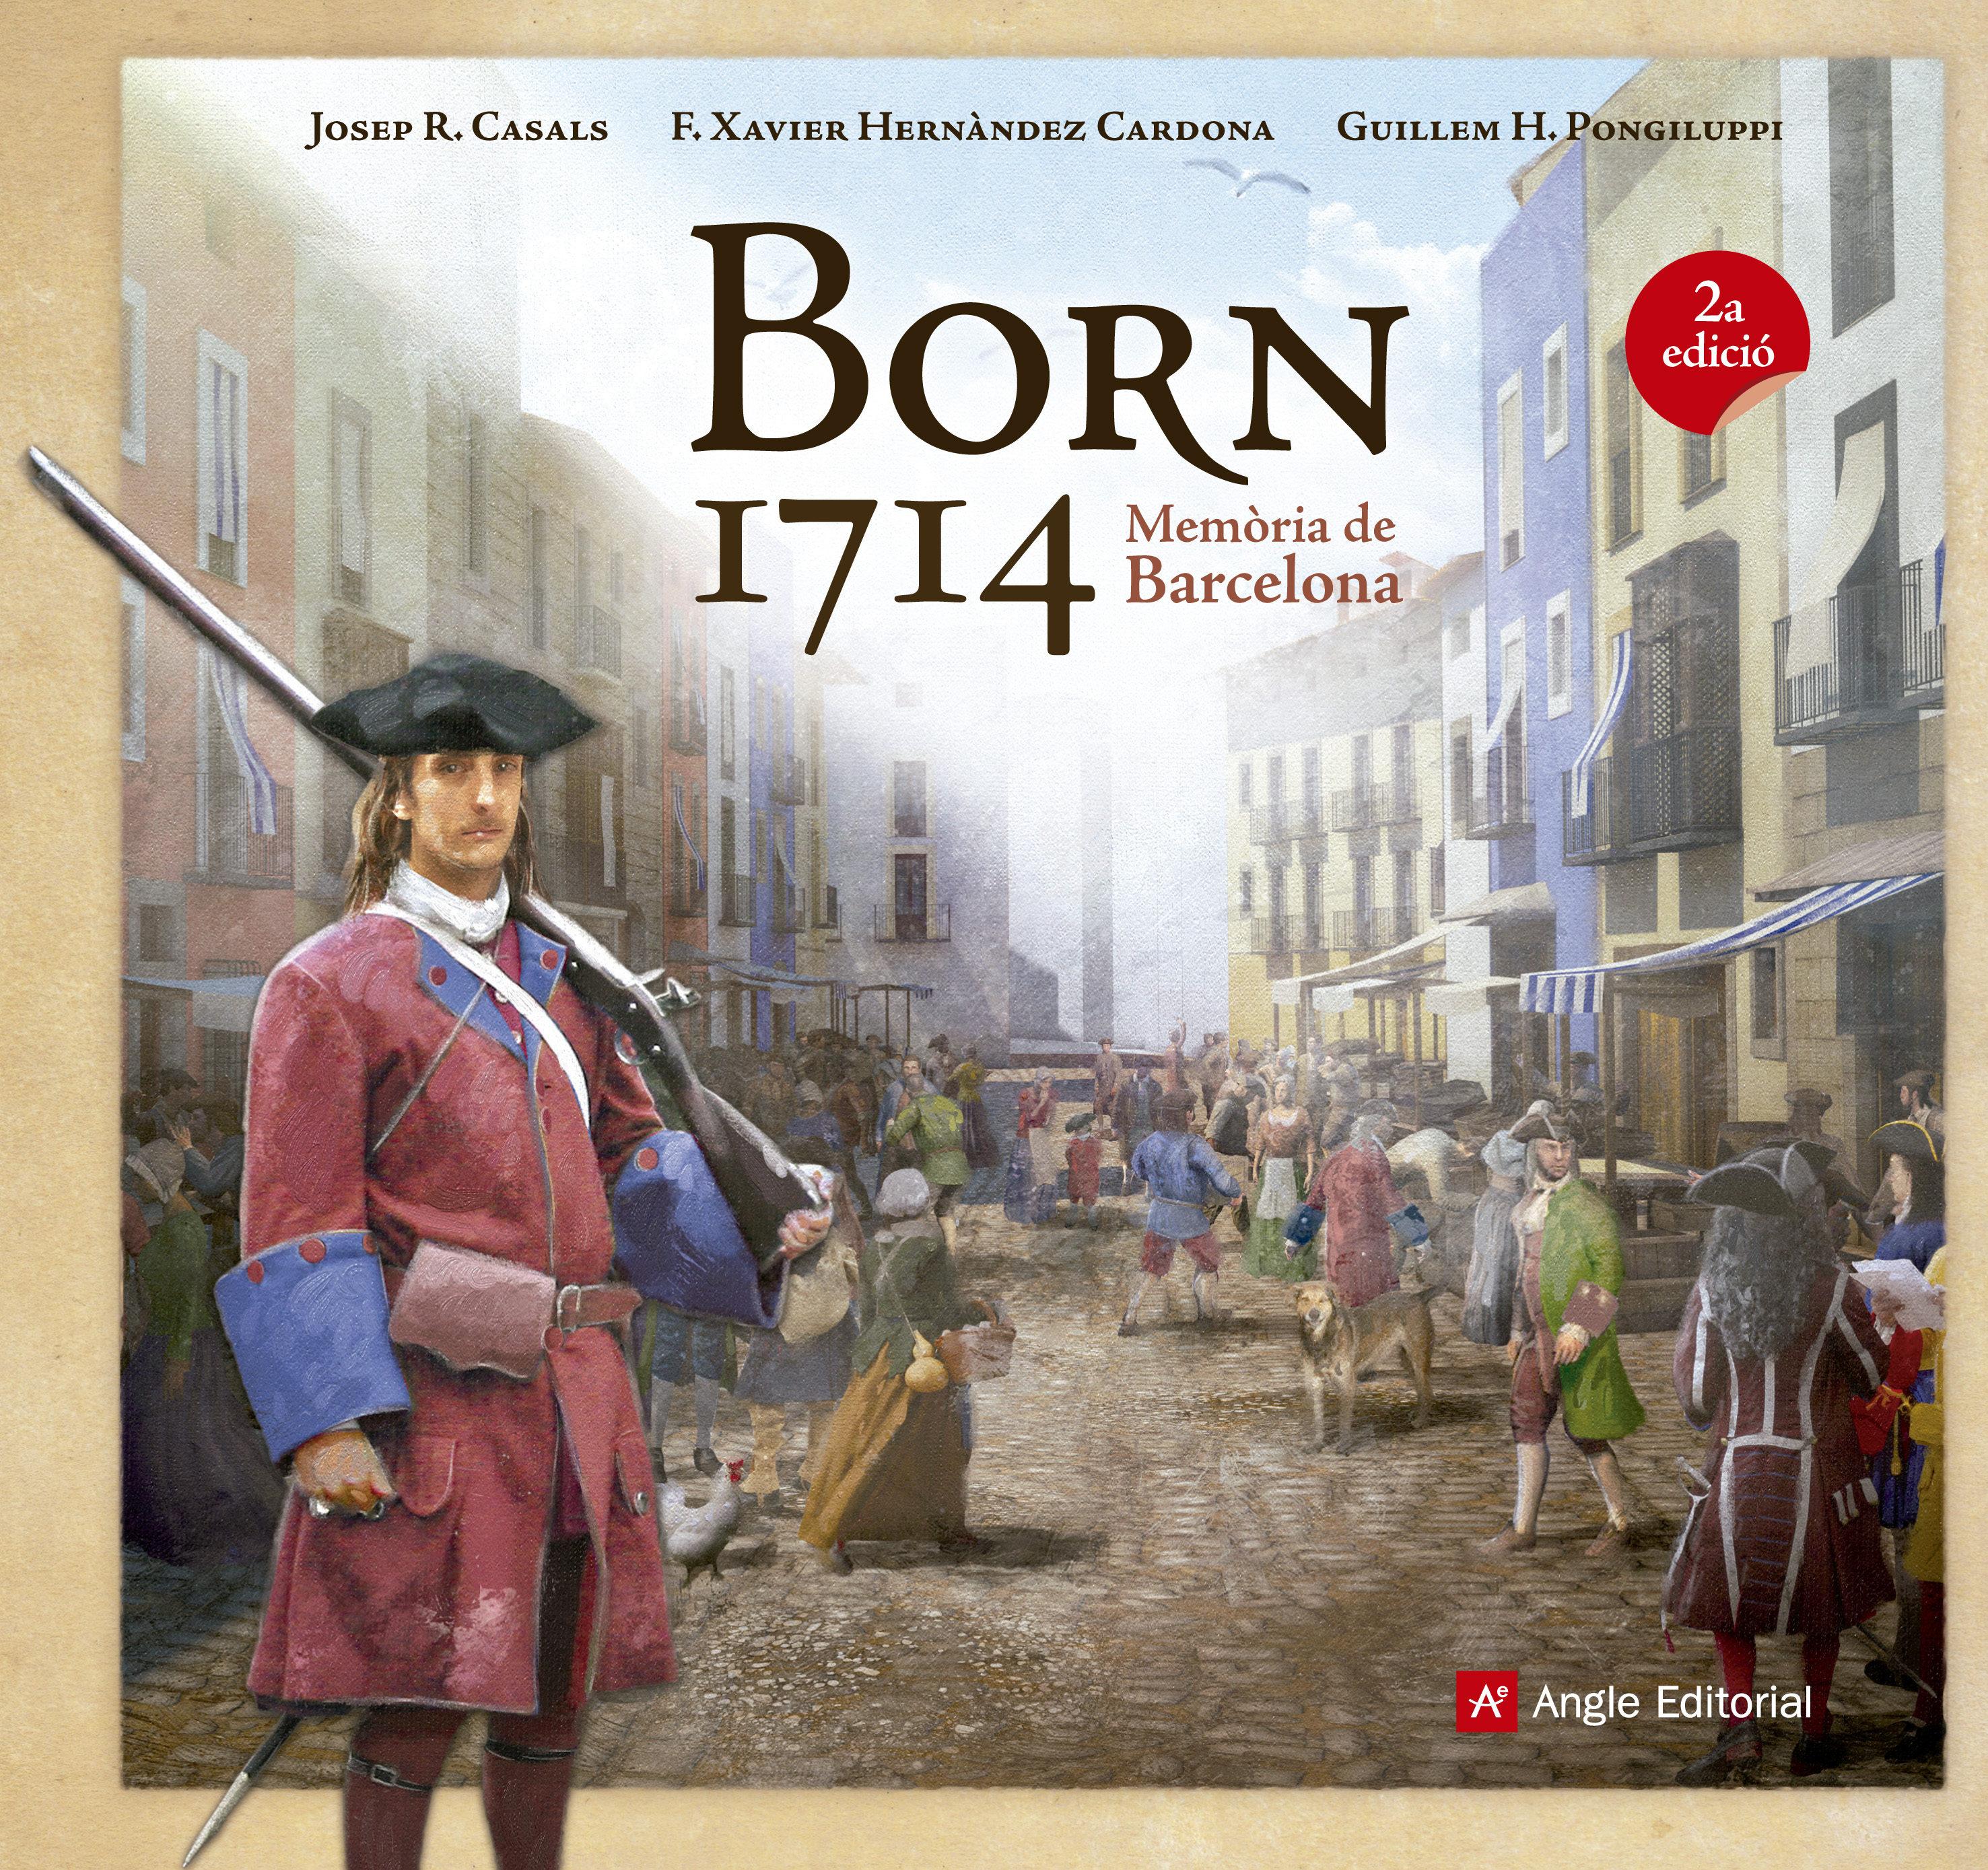 born 1714. memòria de barcelona-francesc xavier hernandez cardona-josep r.  casals